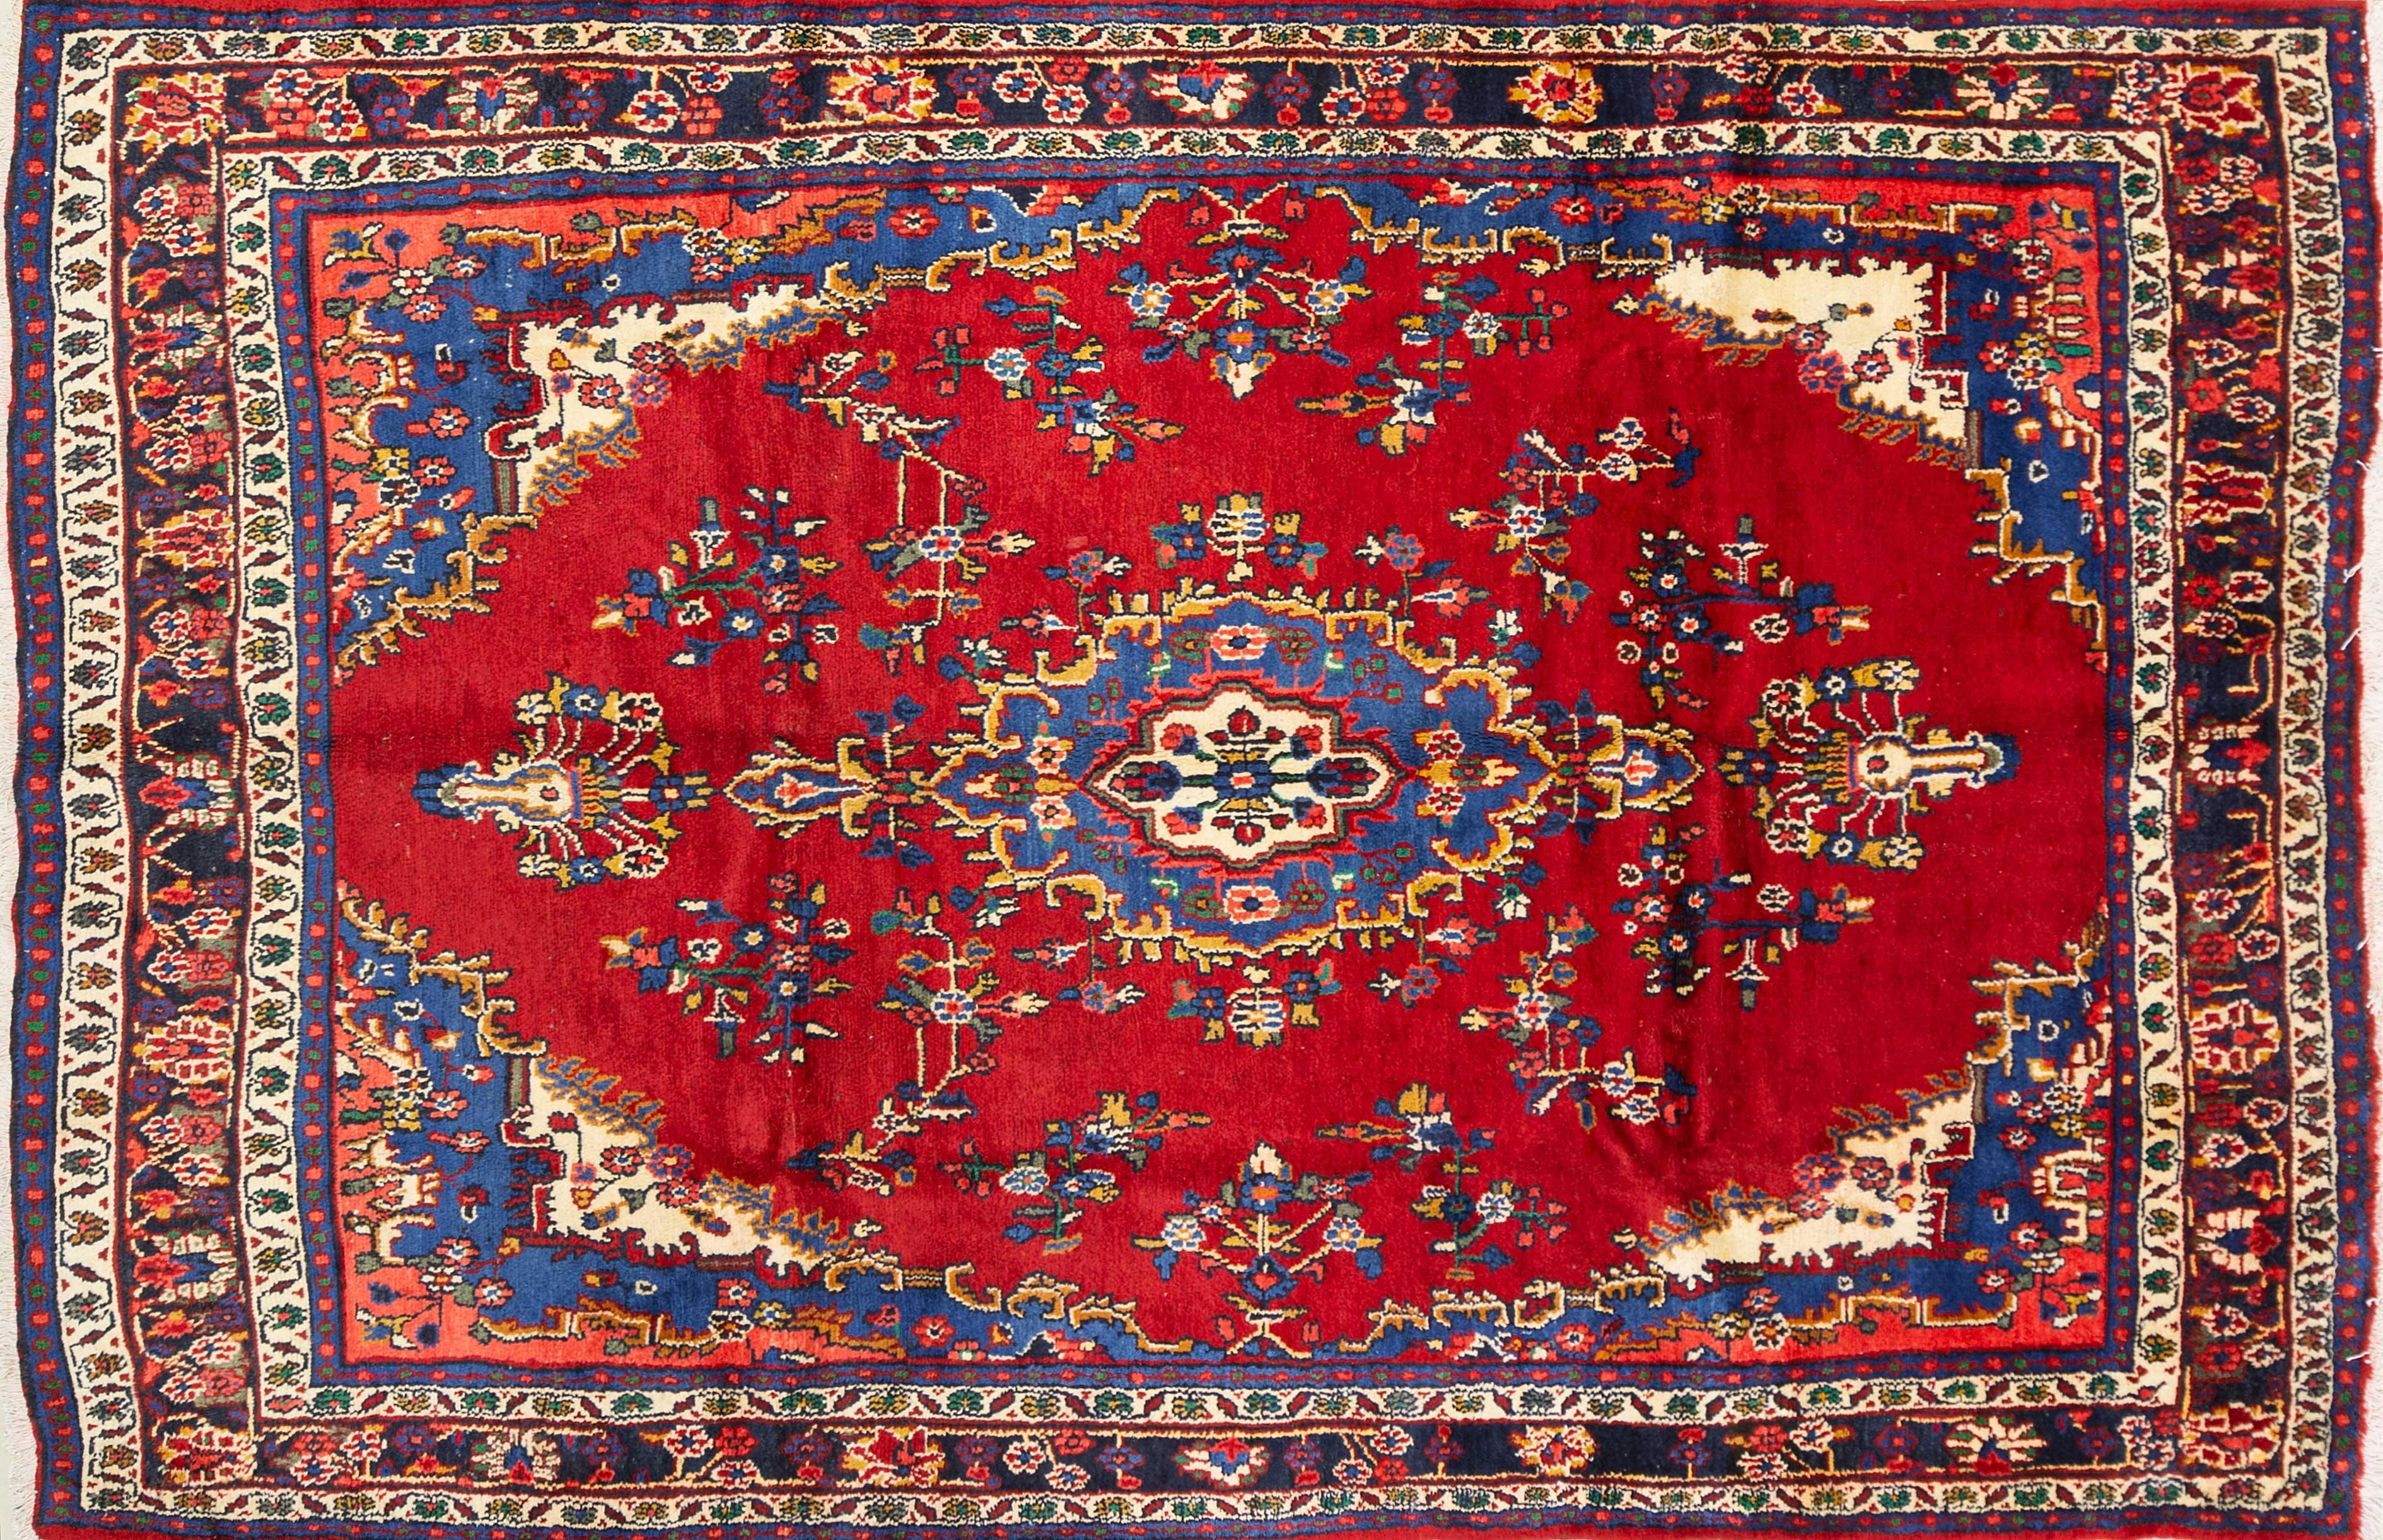 A Persian Hand Knotted Hamadan Carpet, 317 x 217